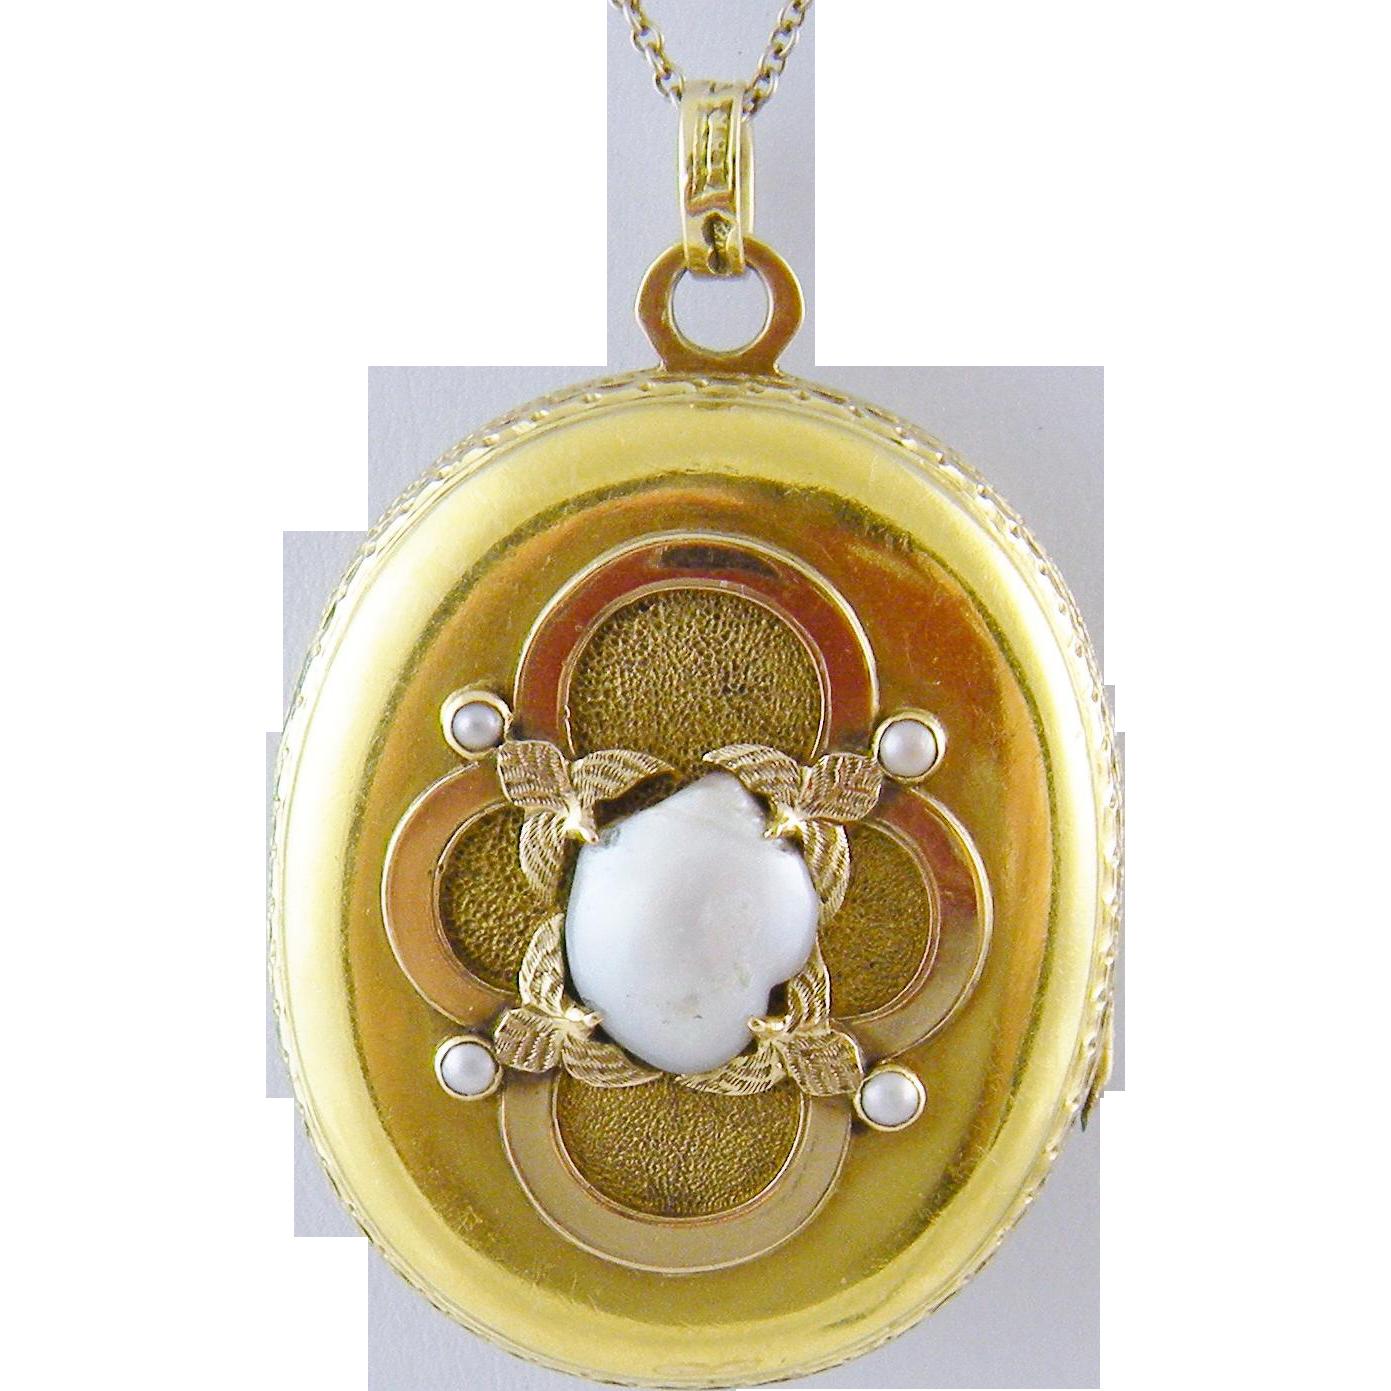 ANTIQUE 14 Kt Gold ENAMEL SCENE and Superb  Seed Pearls Locket Pendant